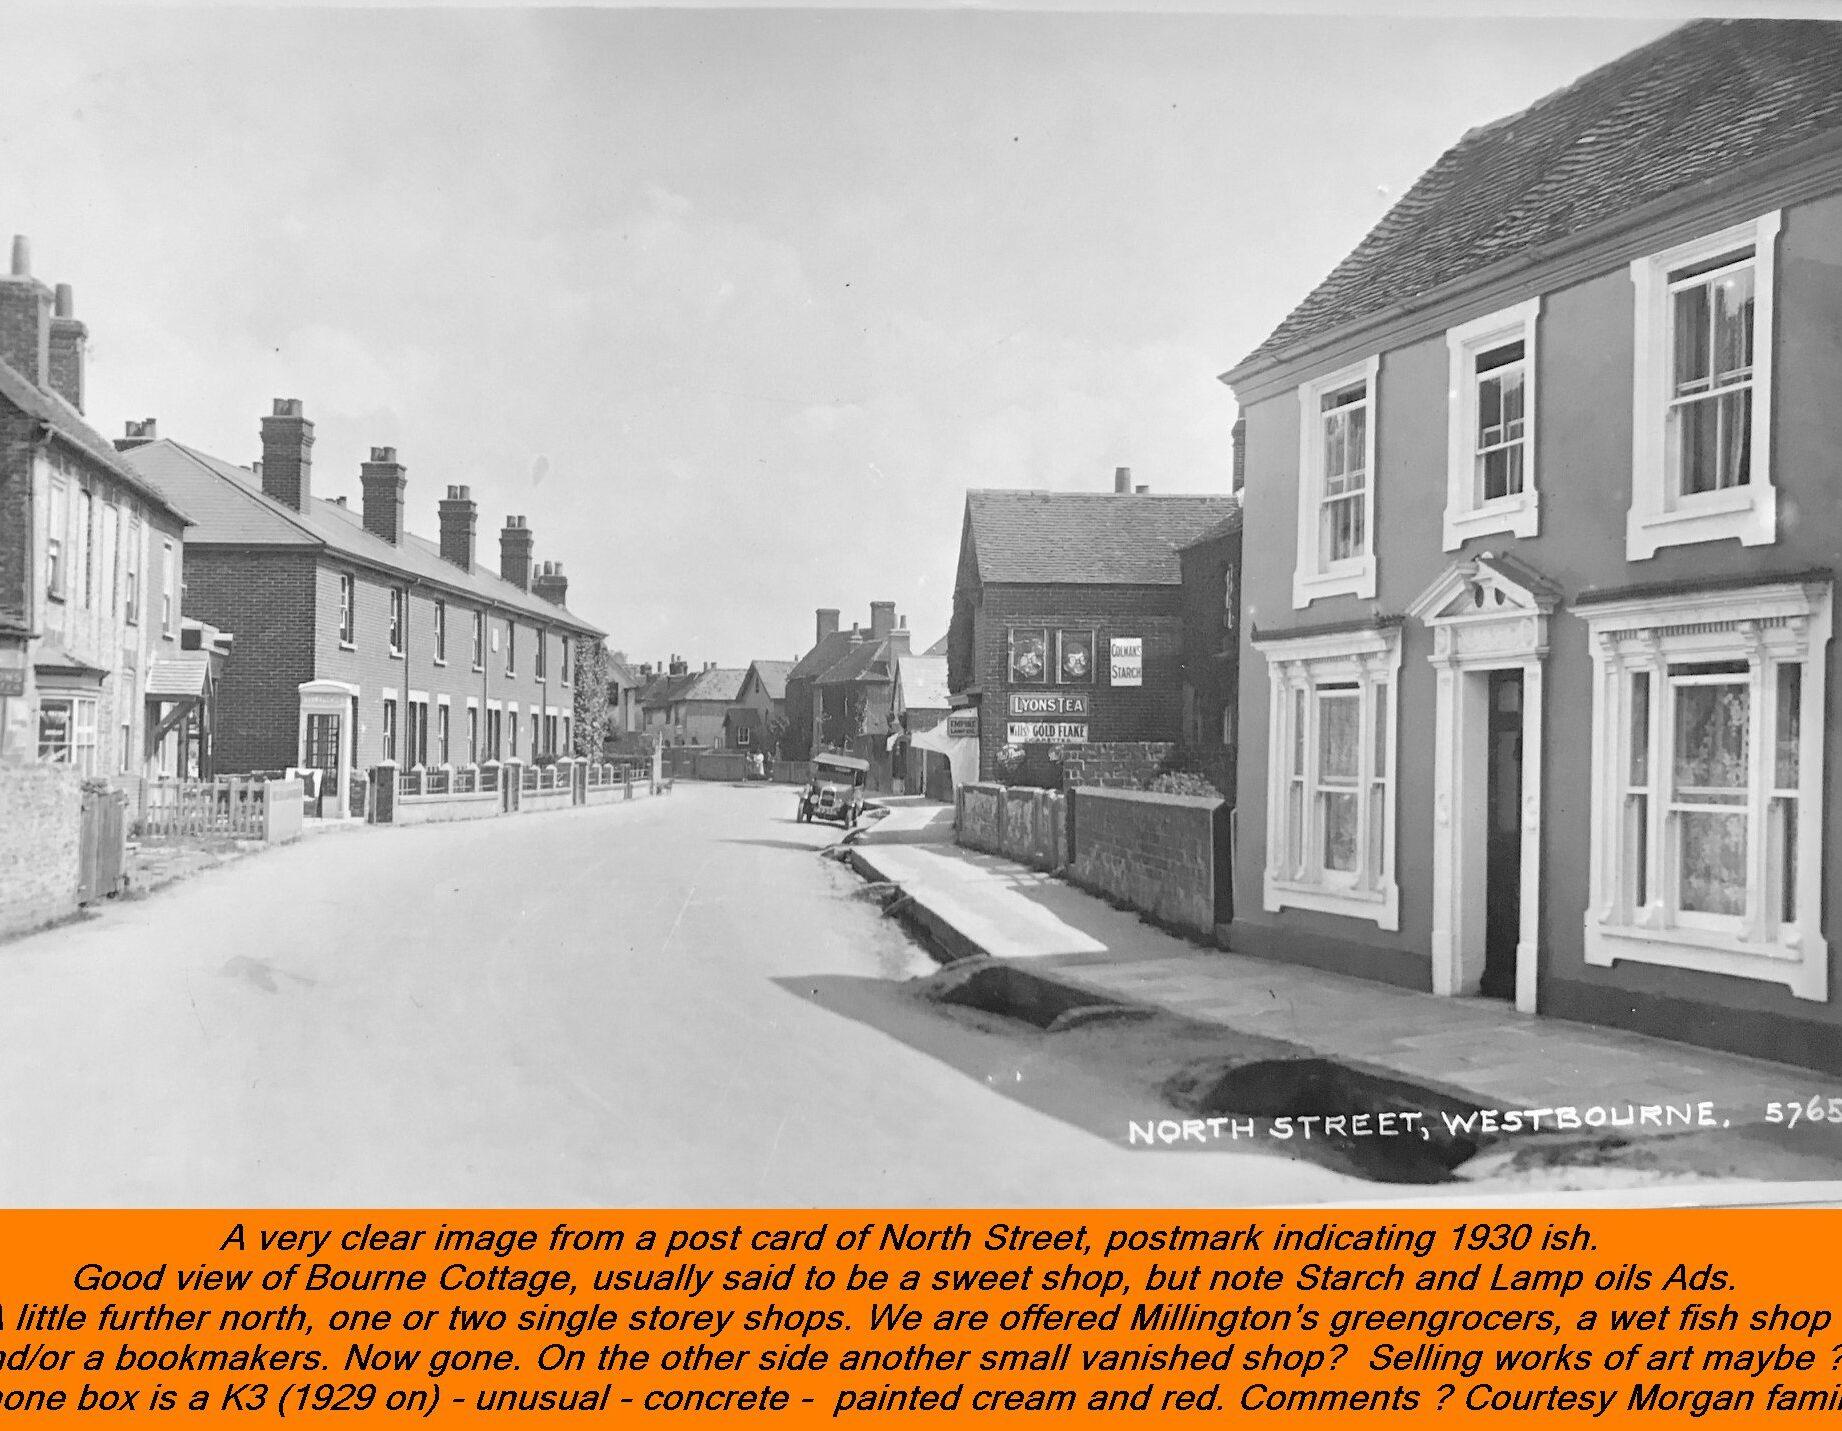 WESTBOURNE HISTORY PHOTO, NORTH STREET, BORNE COTTAGE, MILLINGTON, K3 PHONE BOX